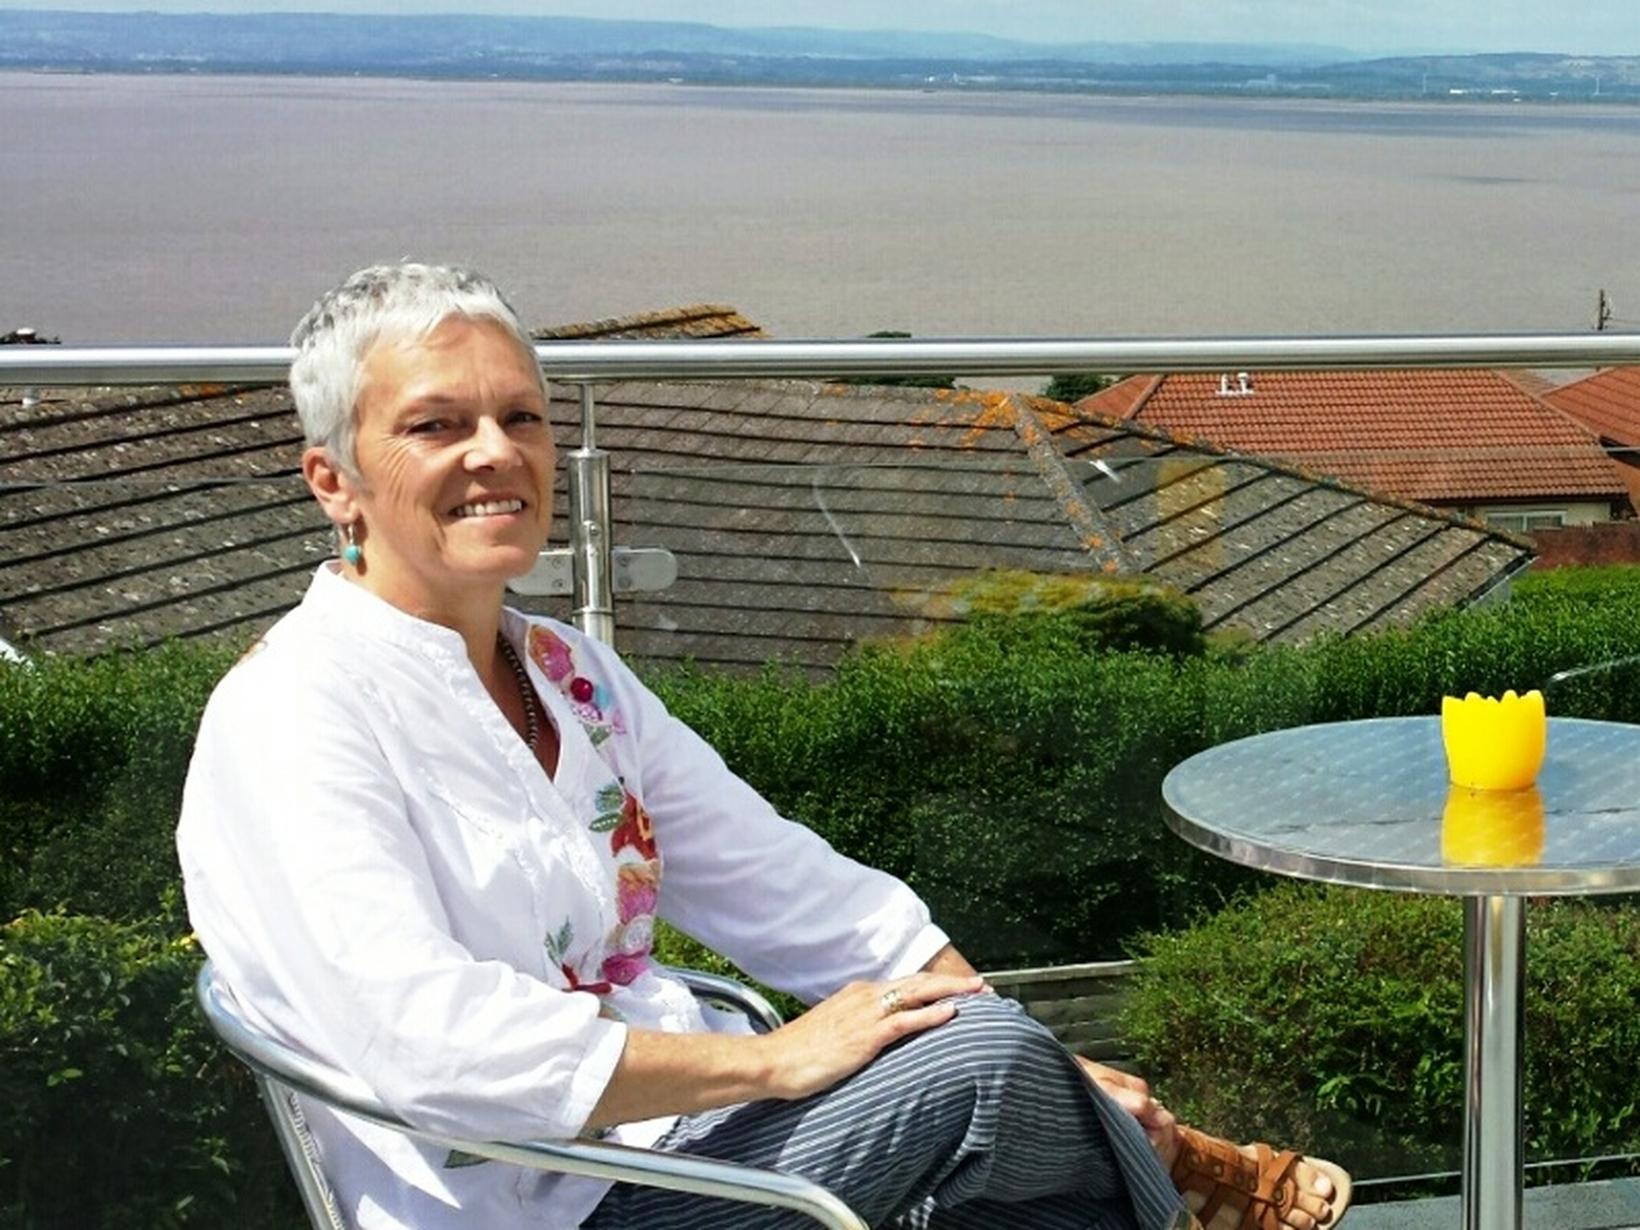 Sue from Bristol, United Kingdom